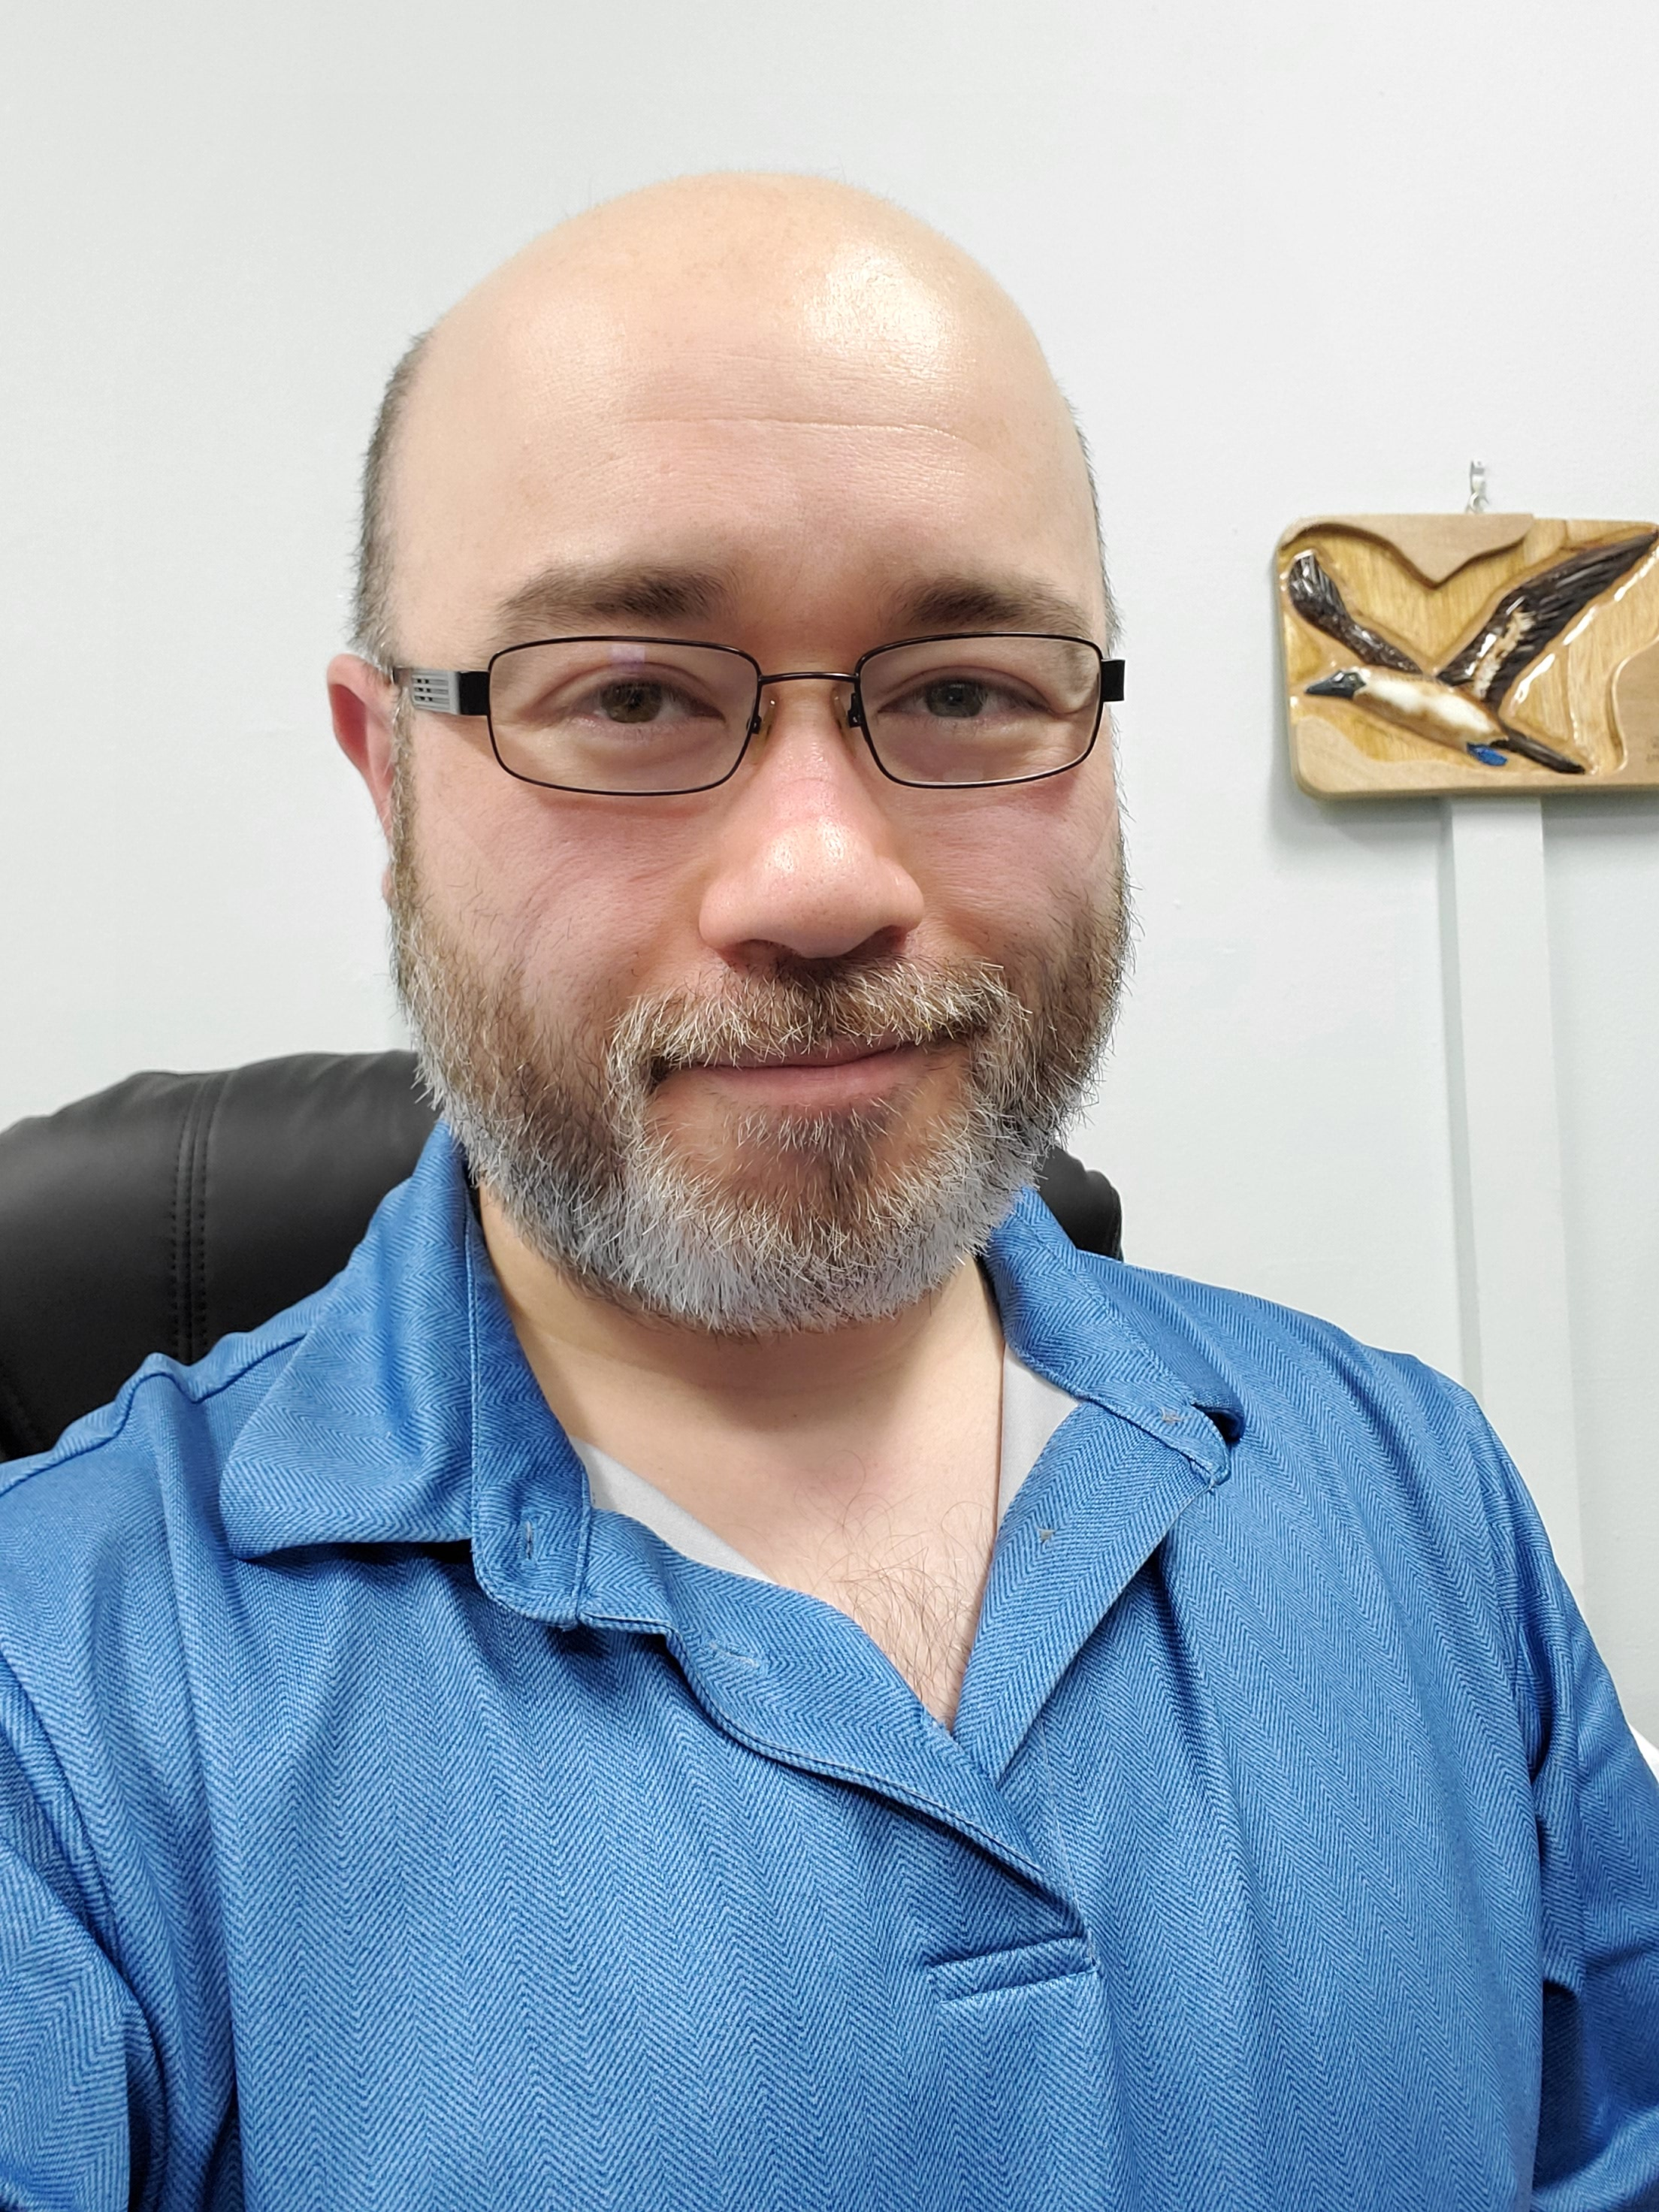 Gabriel F. Arauz. Chief Compliance Officer, Chief Grantwritting Director, Chief Information Technology Technician